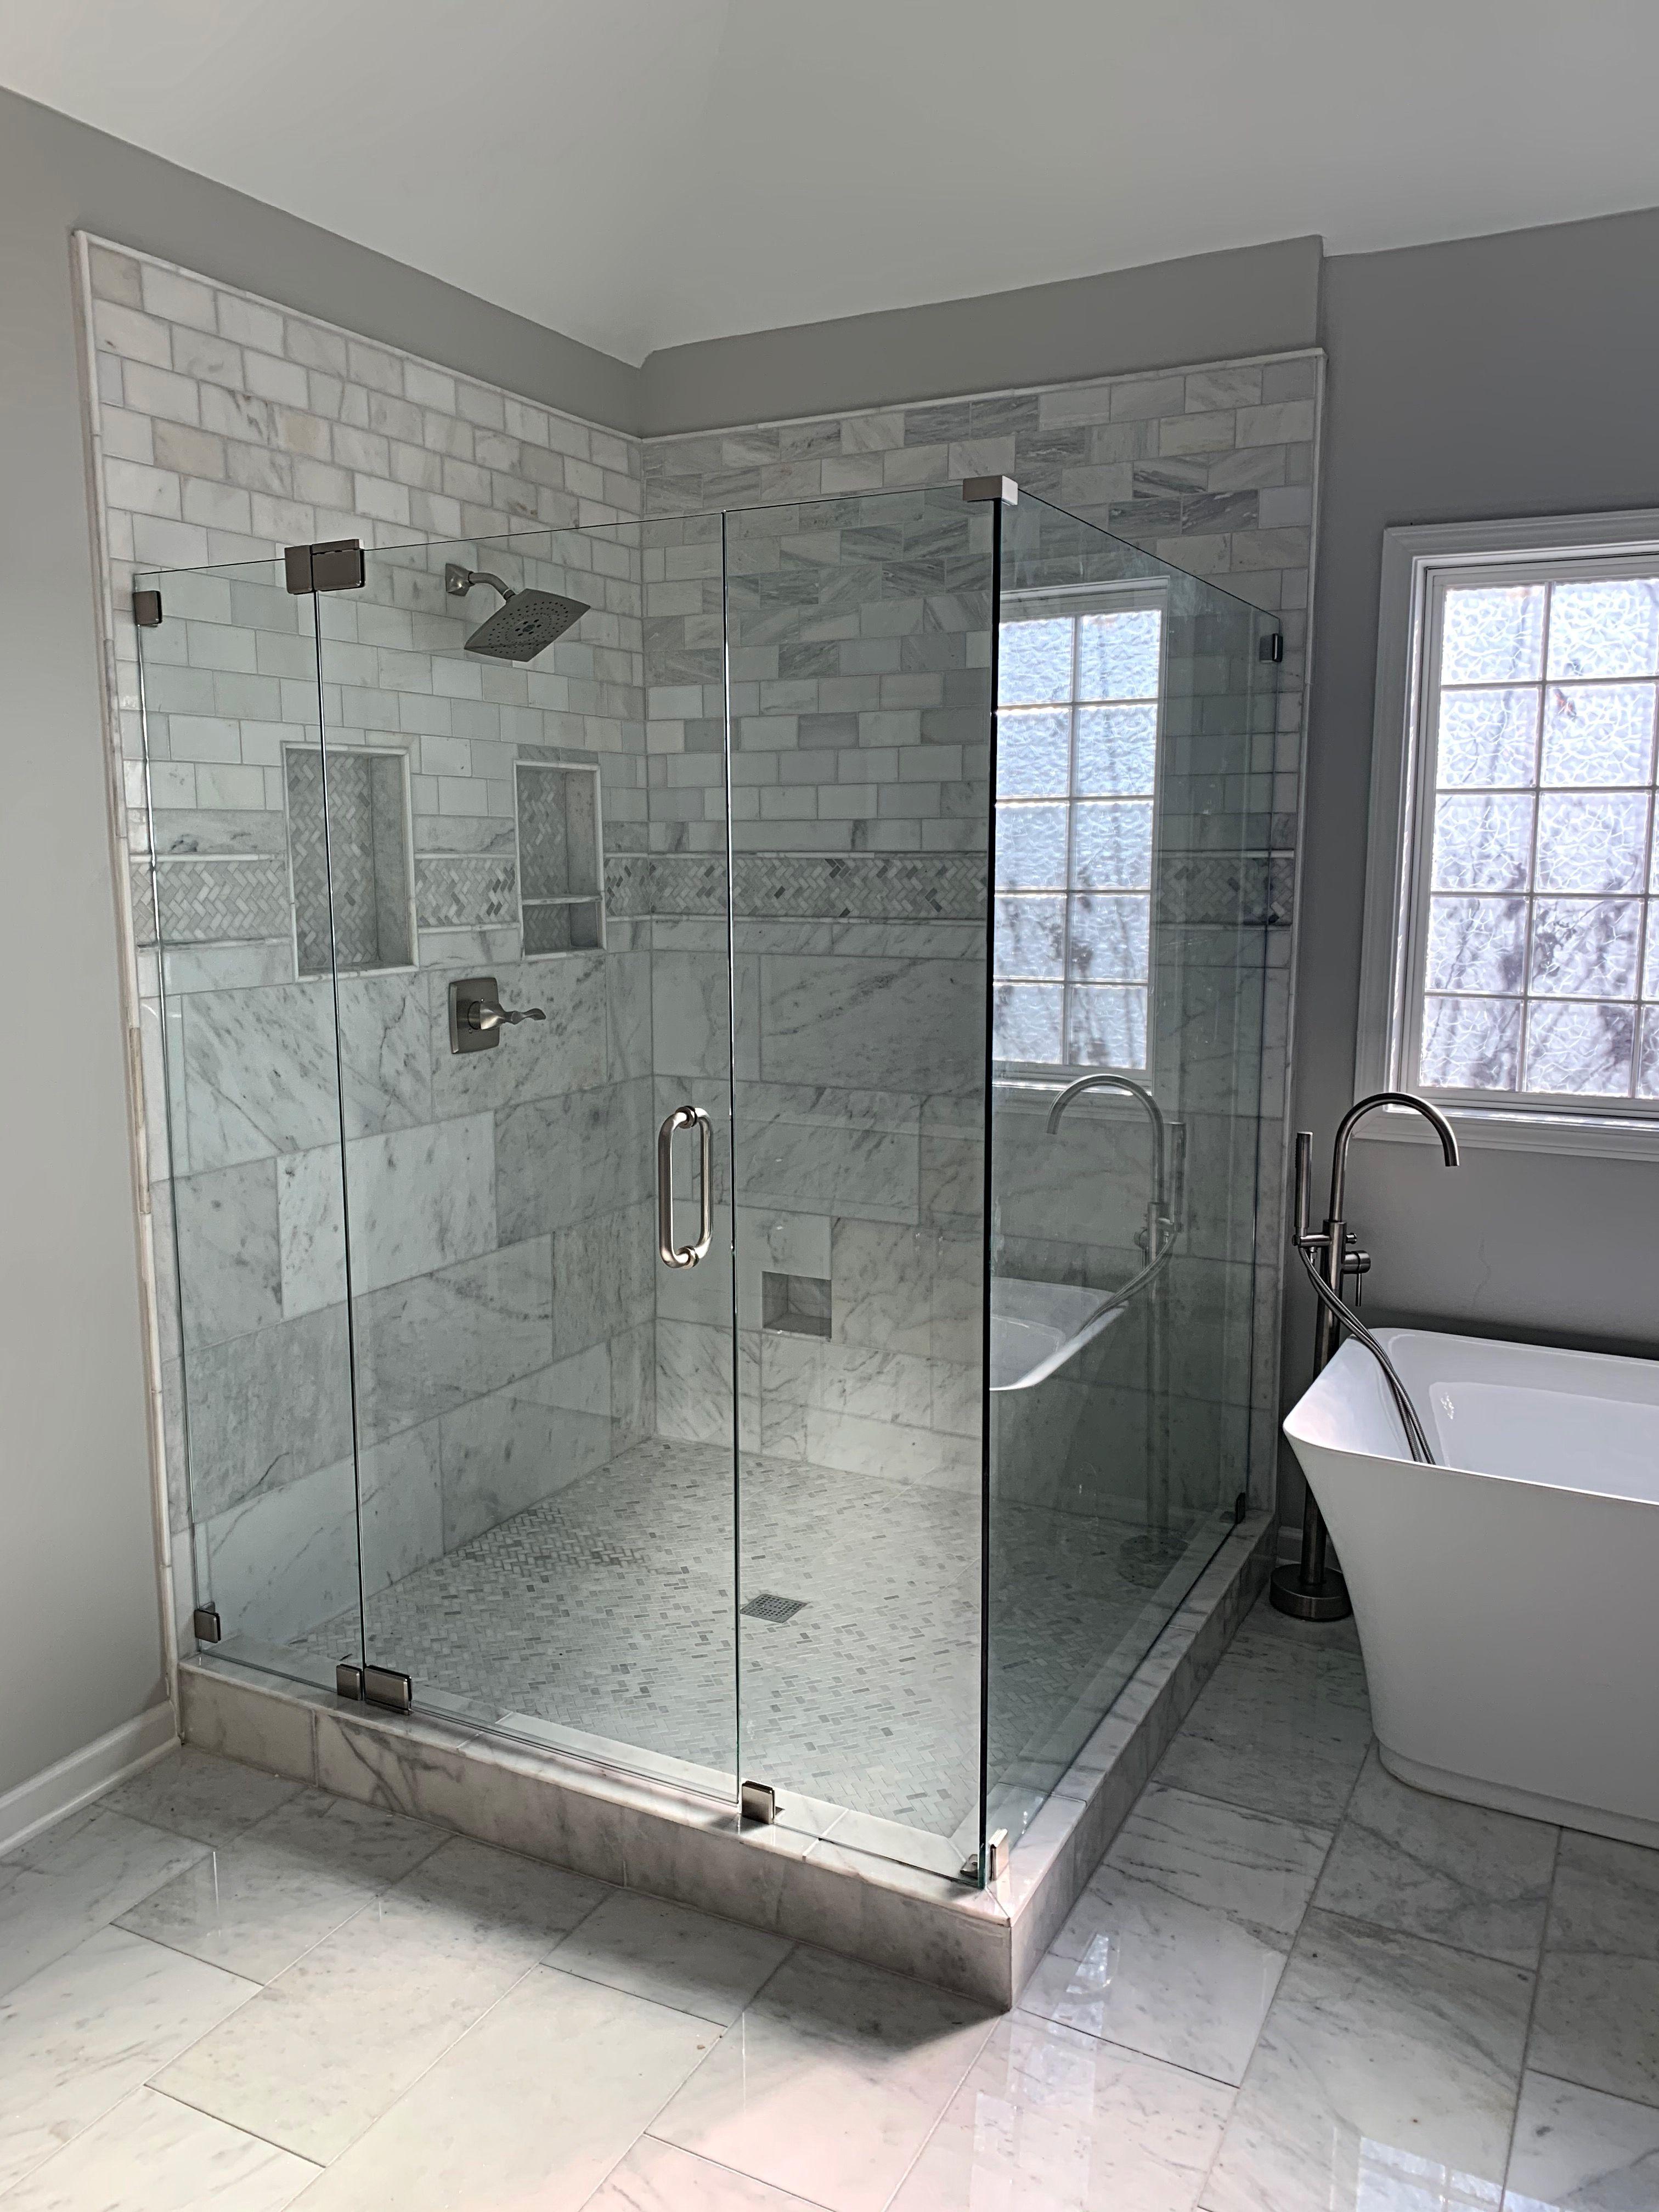 Bathroom Remodeling Ideas Bathrooms Remodel Shower Remodel Bathroom Design